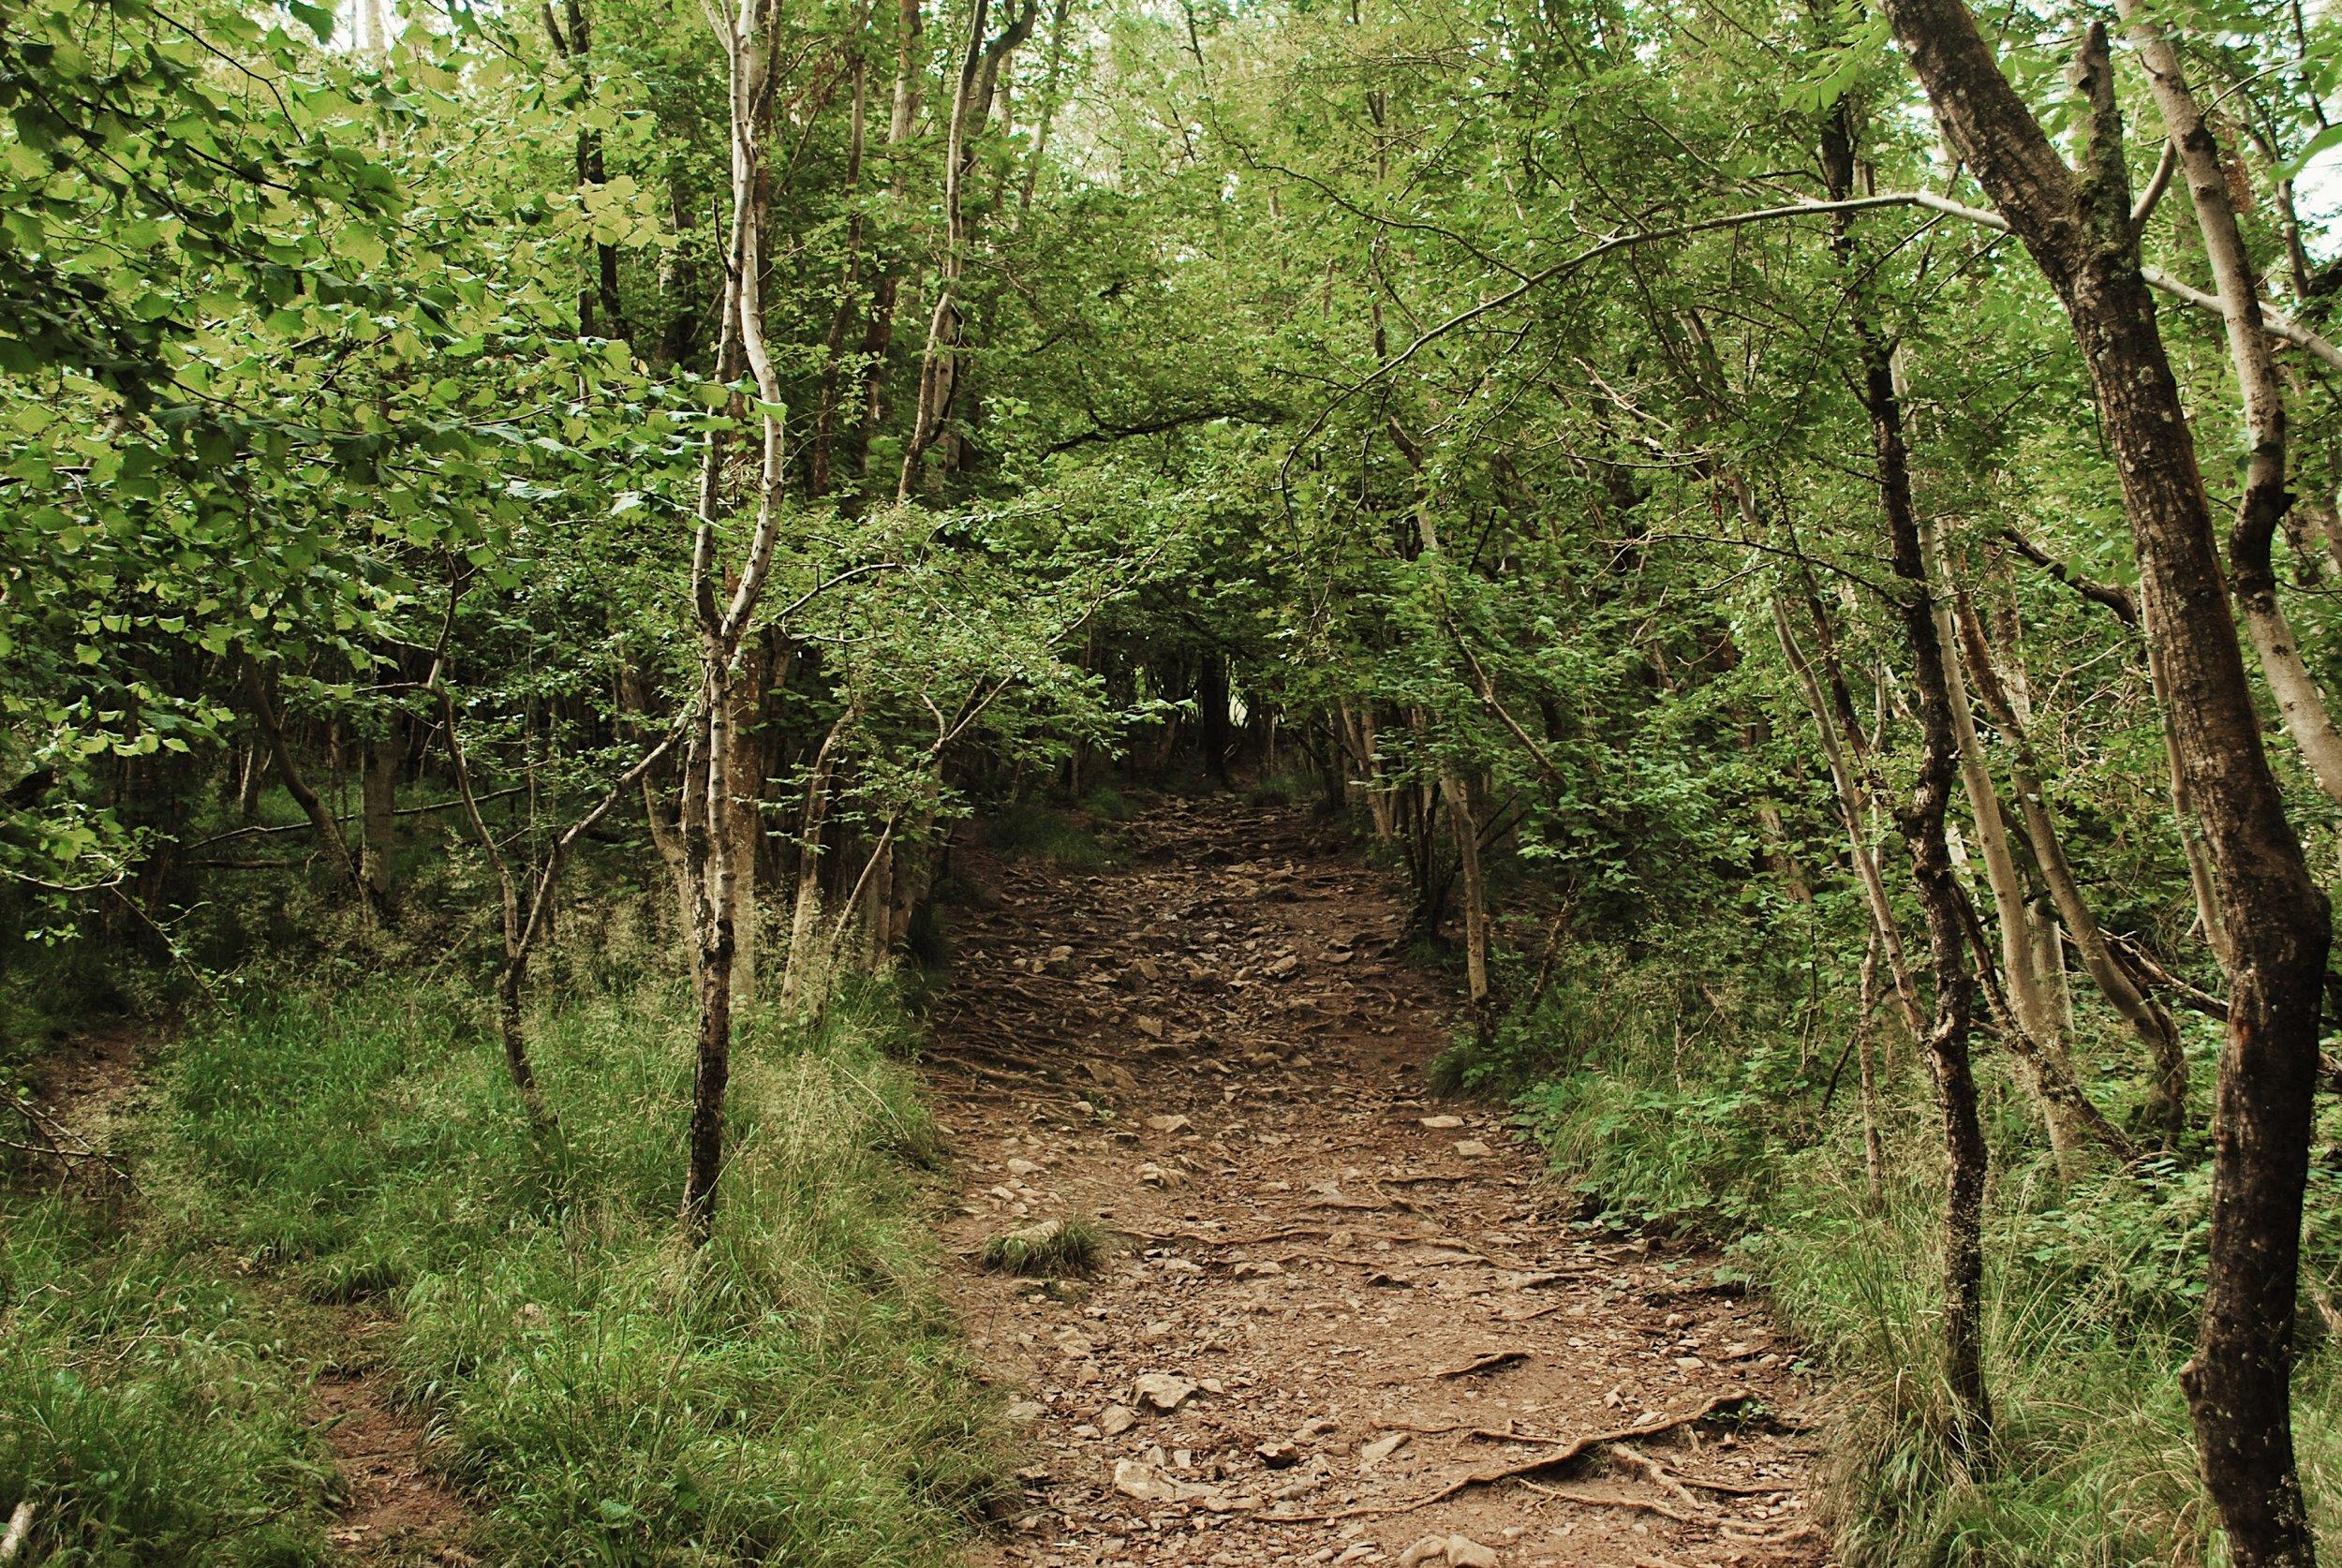 The steep climb through the woods